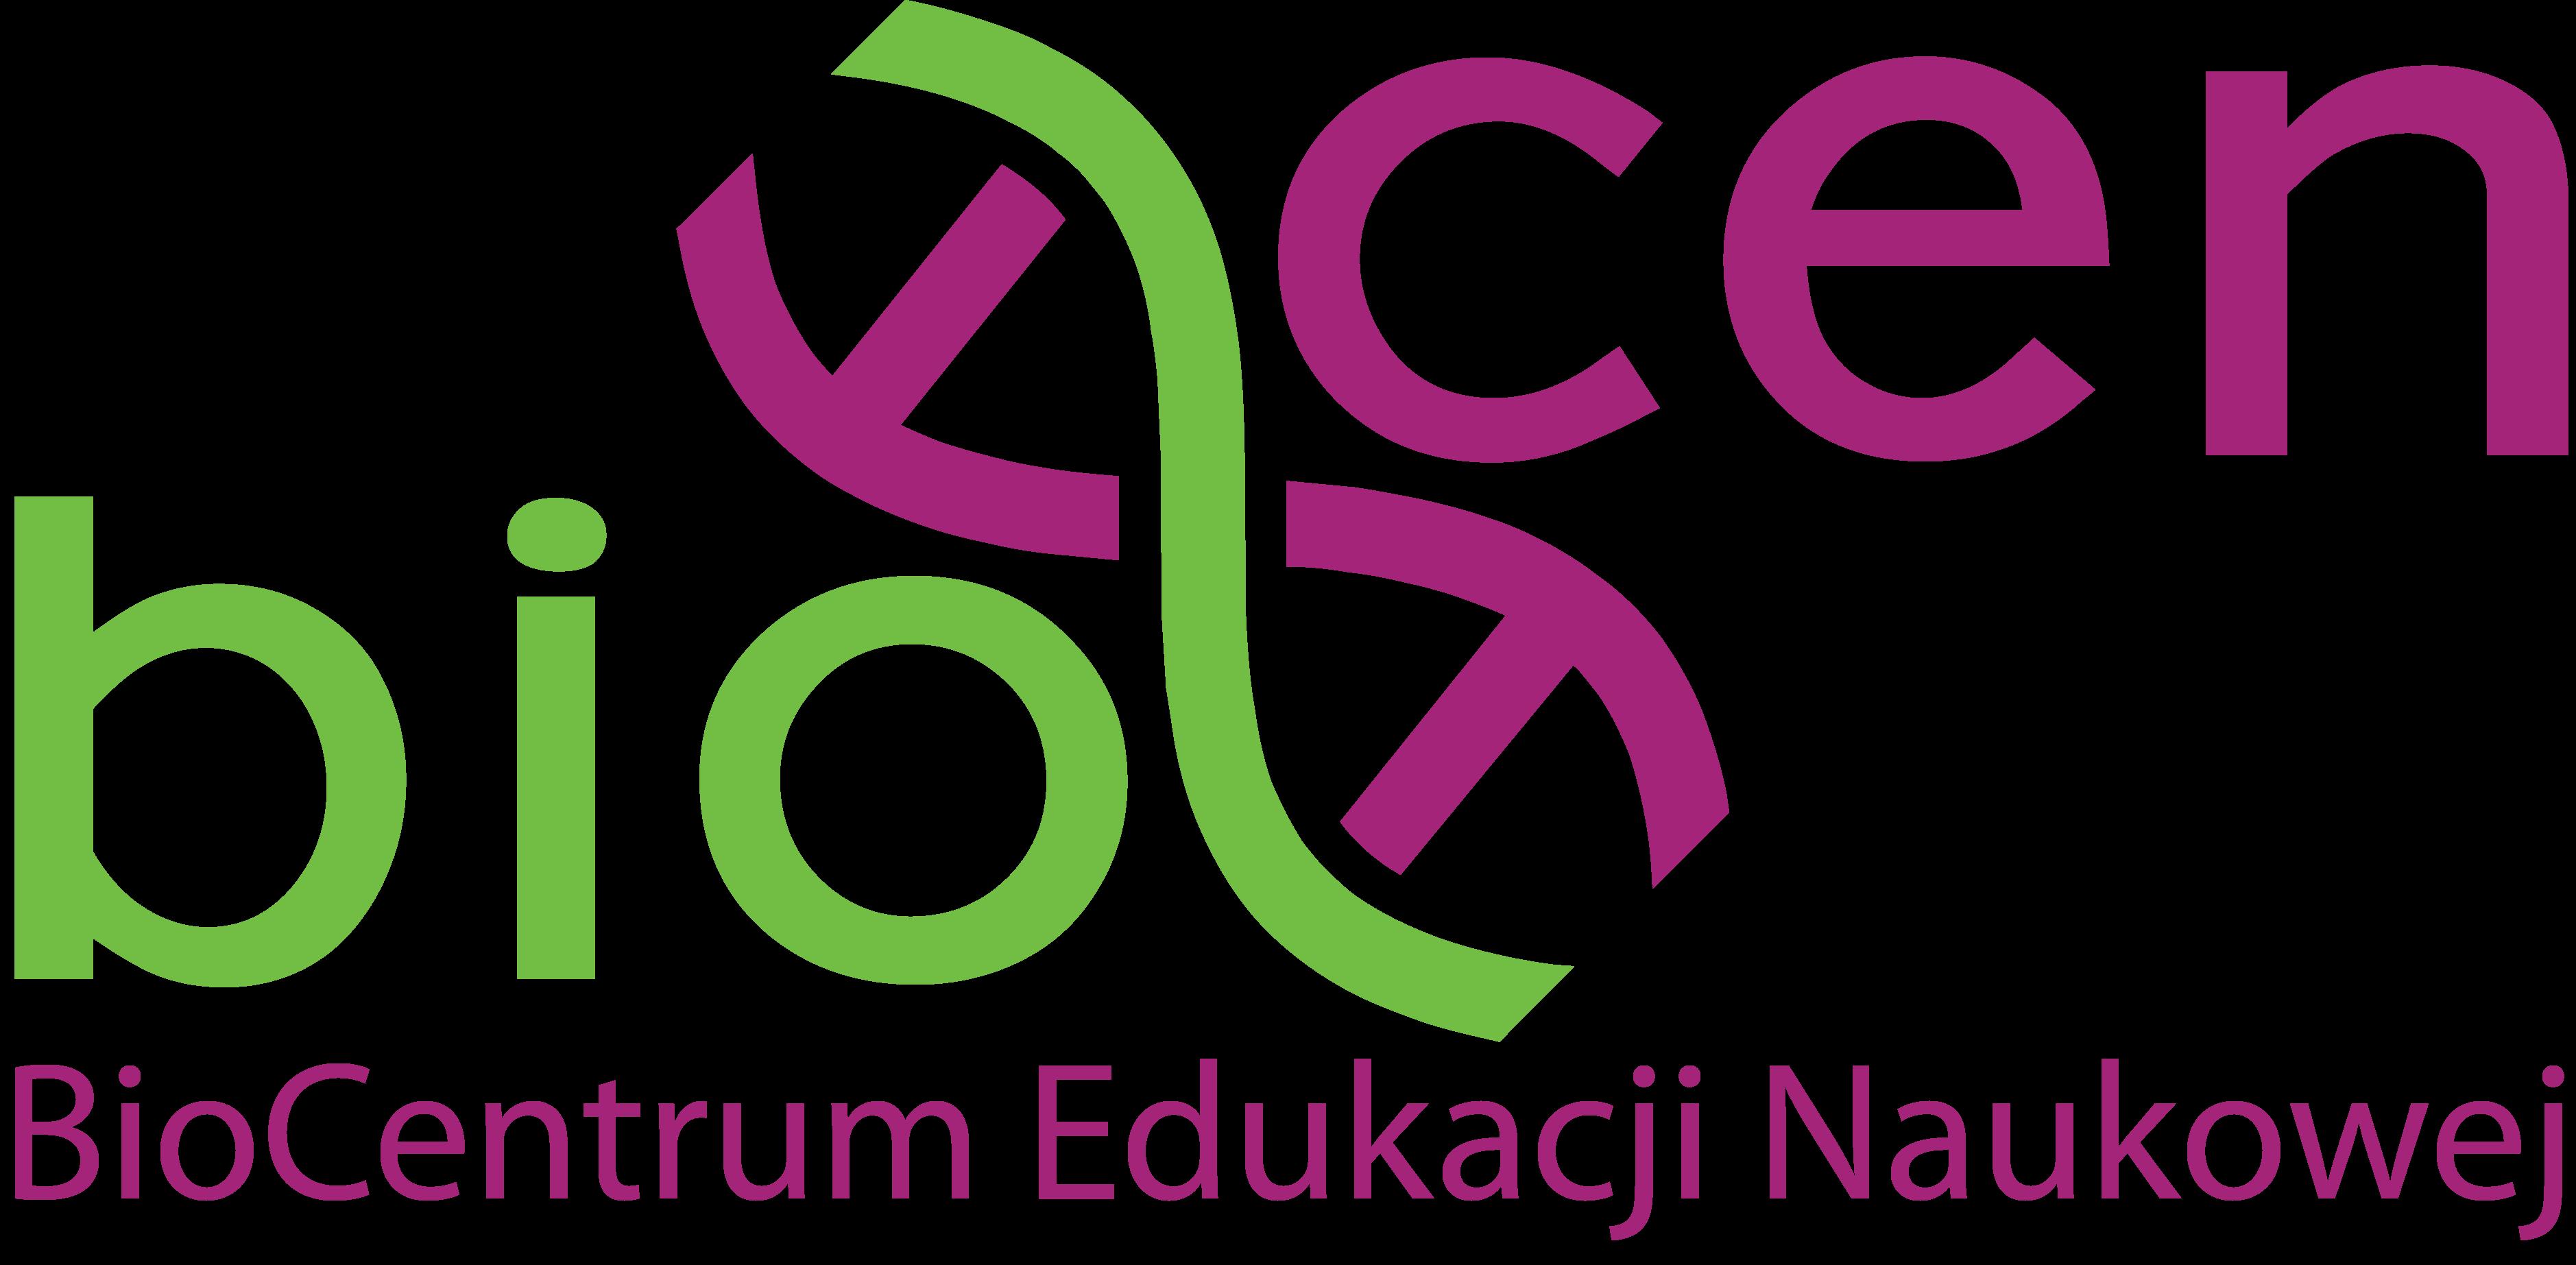 Biocentrum Edukacji Naukowej